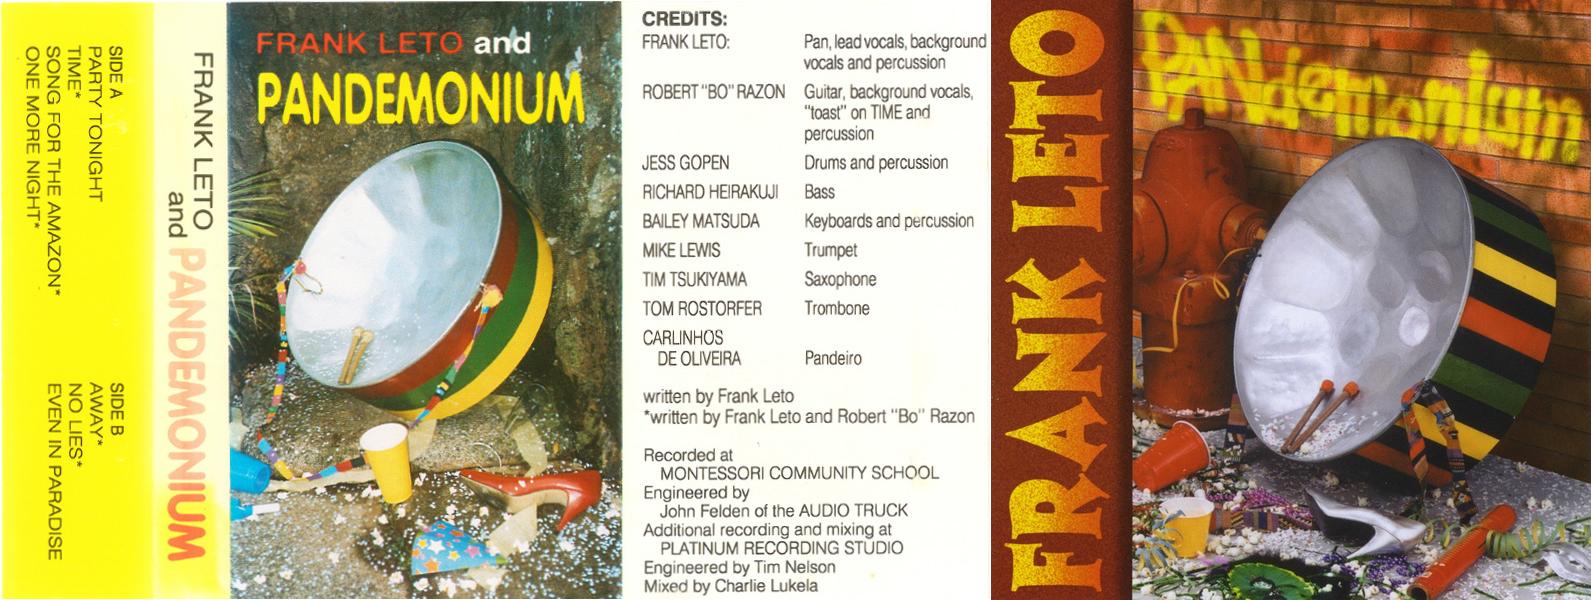 08-008-2 Frank Leto and PANdemonium – Frank Leto and PANdemonium